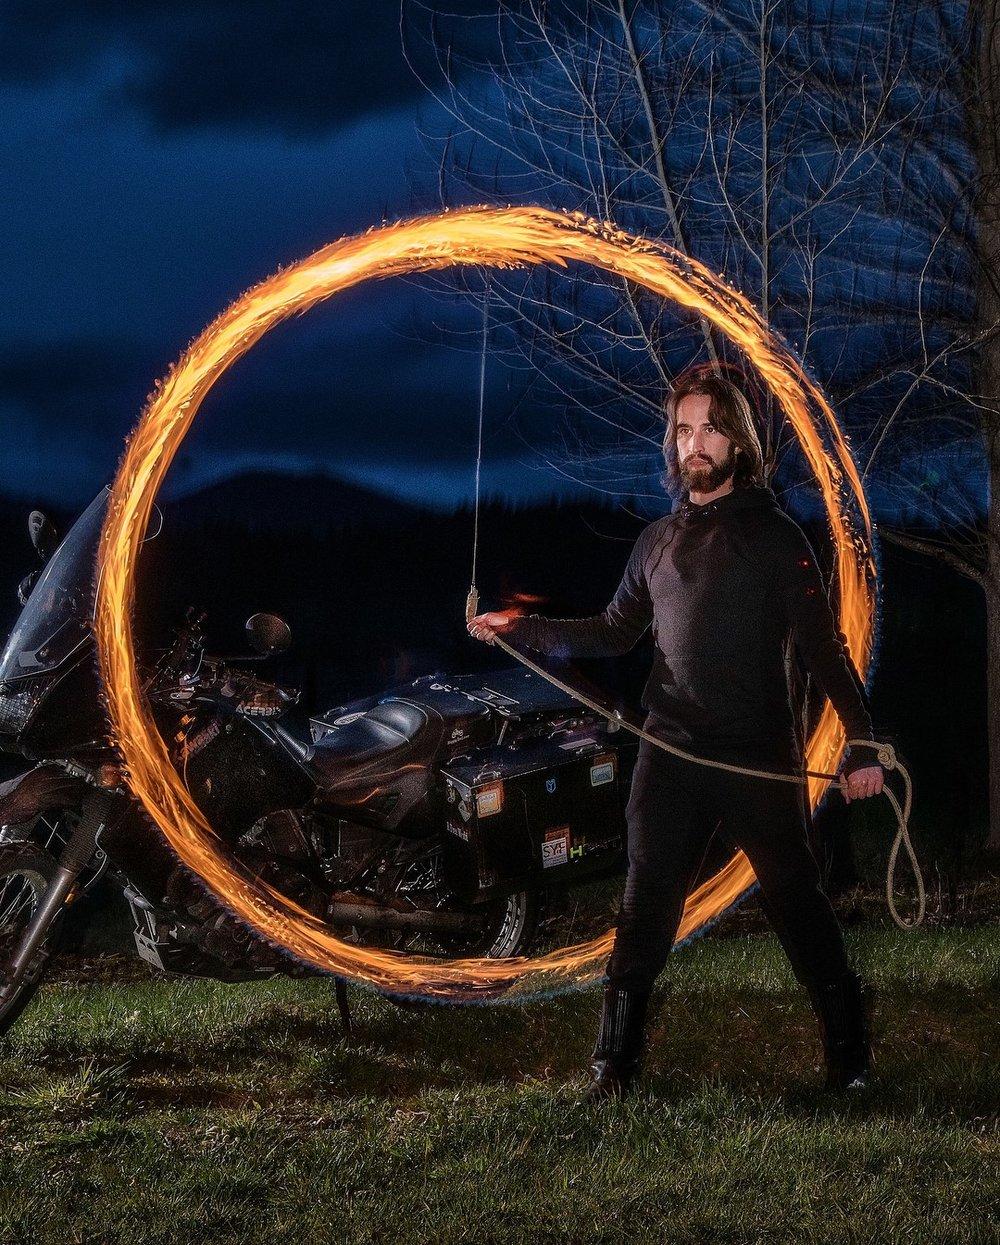 jesse_motorcyclefire.jpg